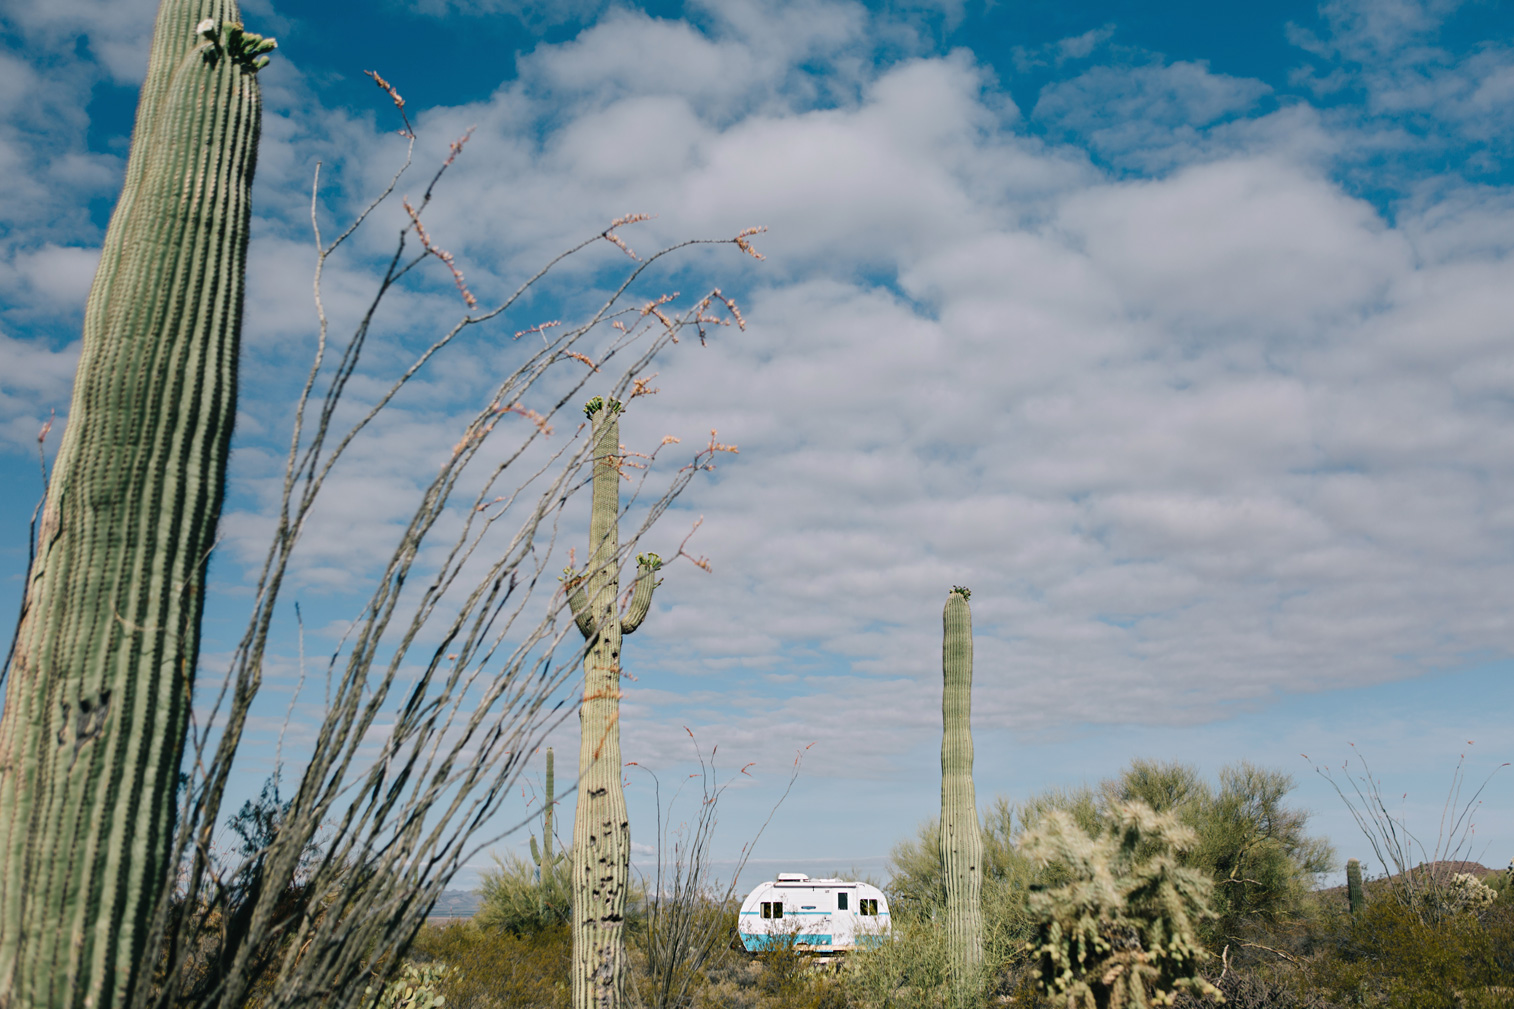 CindyGiovagnoli_Saguaro_National_Park_Tucson_Arizona_flowers_rain_spring_desert-015.jpg